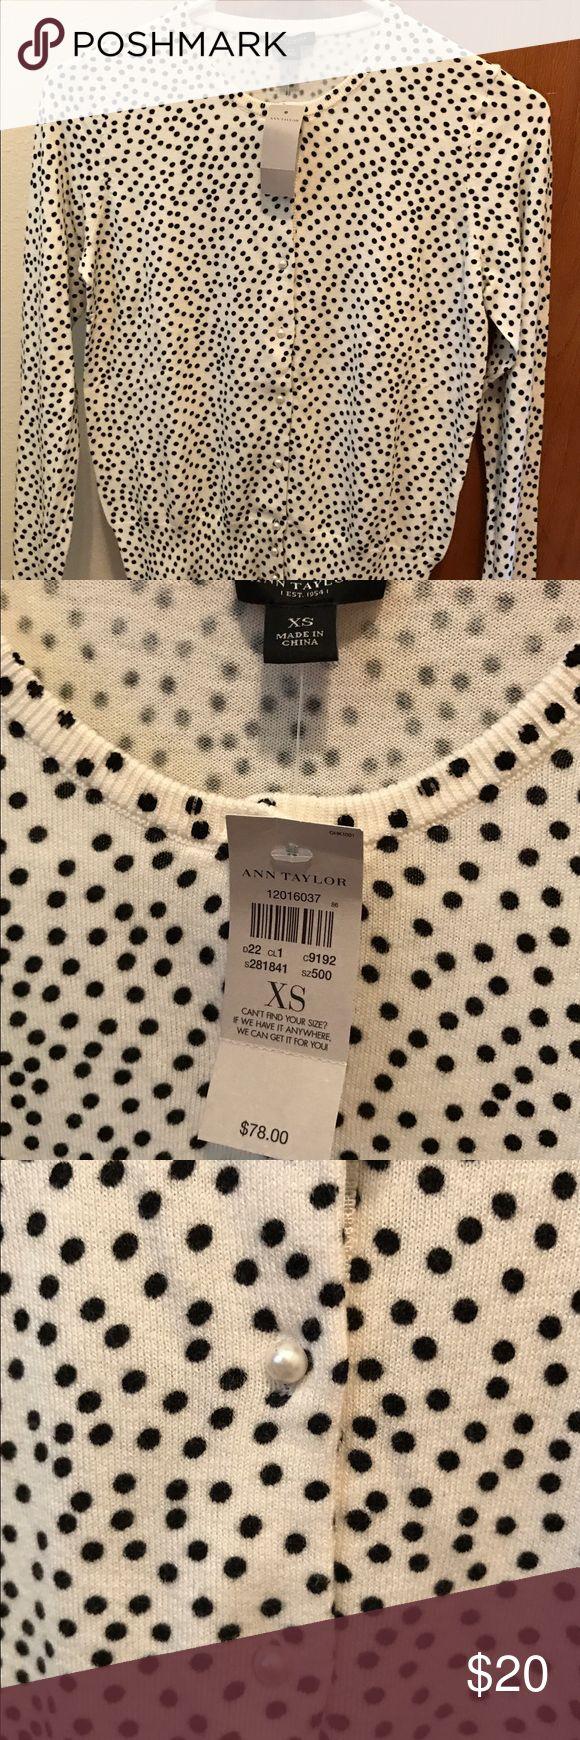 NWT Ann Taylor loft cardigan w/ polkadots n pearls Brand new with tags! Retail $78 never worn , gorgeous gorgeous cream cardigan with pearl buttons & black polka dots. SizeXS Ann Taylor Sweaters Cardigans